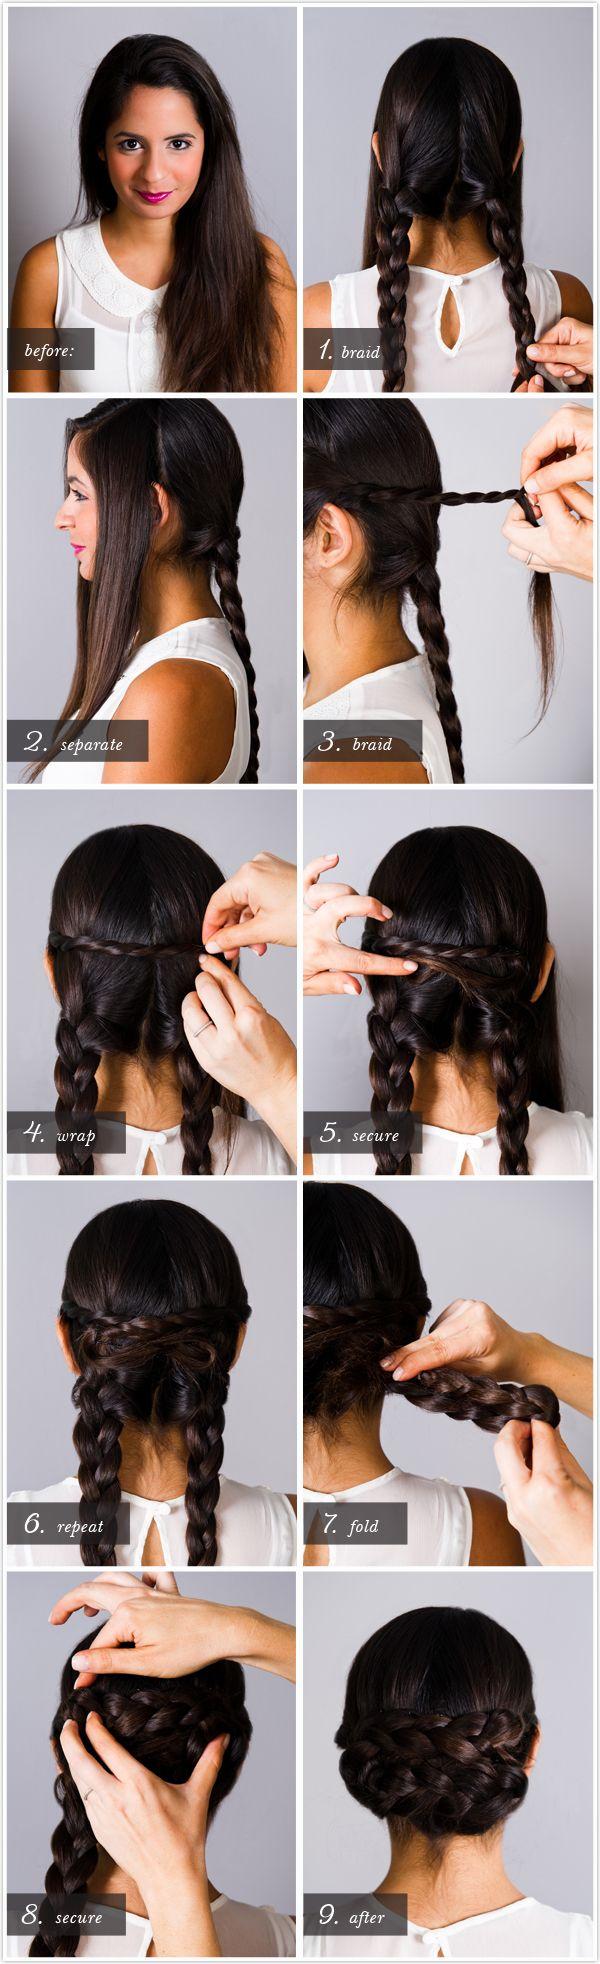 Tremendous Simple Updos Braids Braids Short Hairstyles For Black Women Fulllsitofus